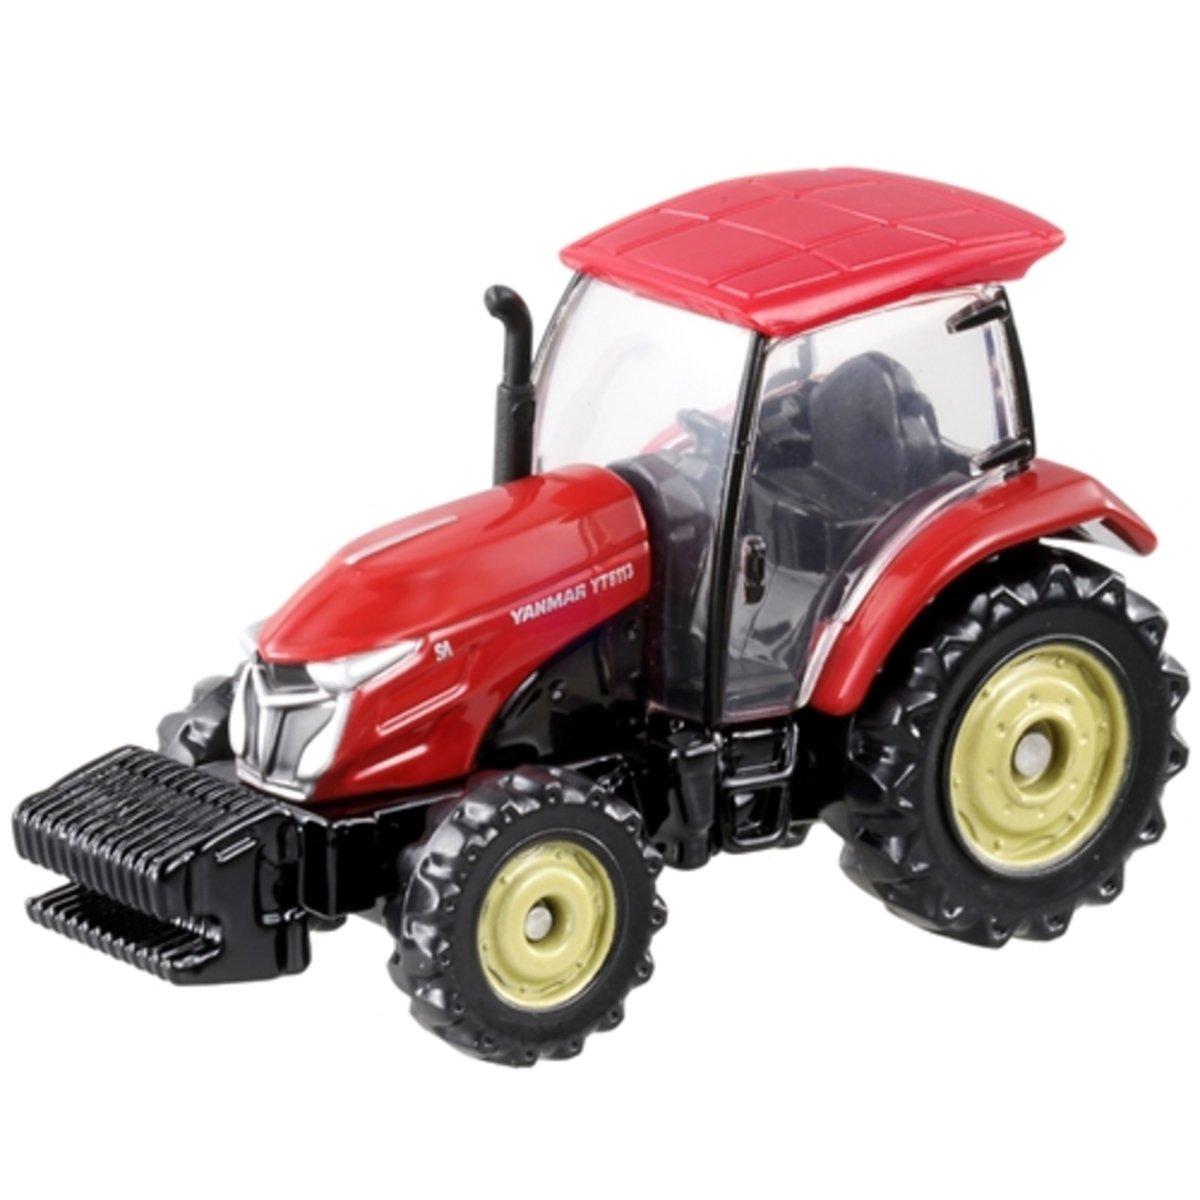 Tomy 83 Yanmar Tractor YT5113 1/76